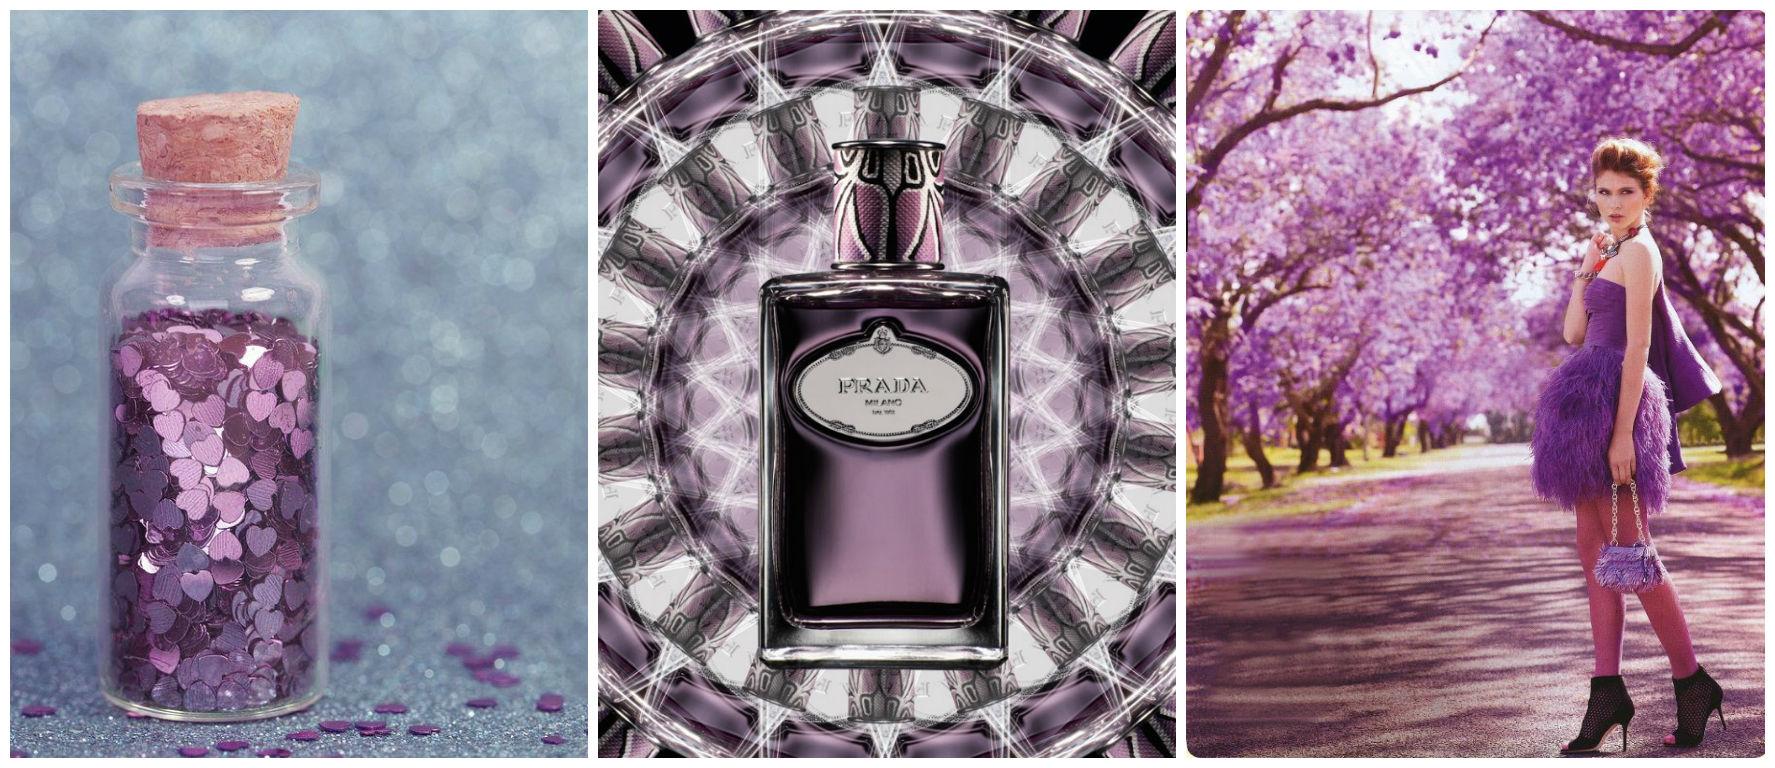 Perfume of the Day: Prada Infusion de Tubereuse